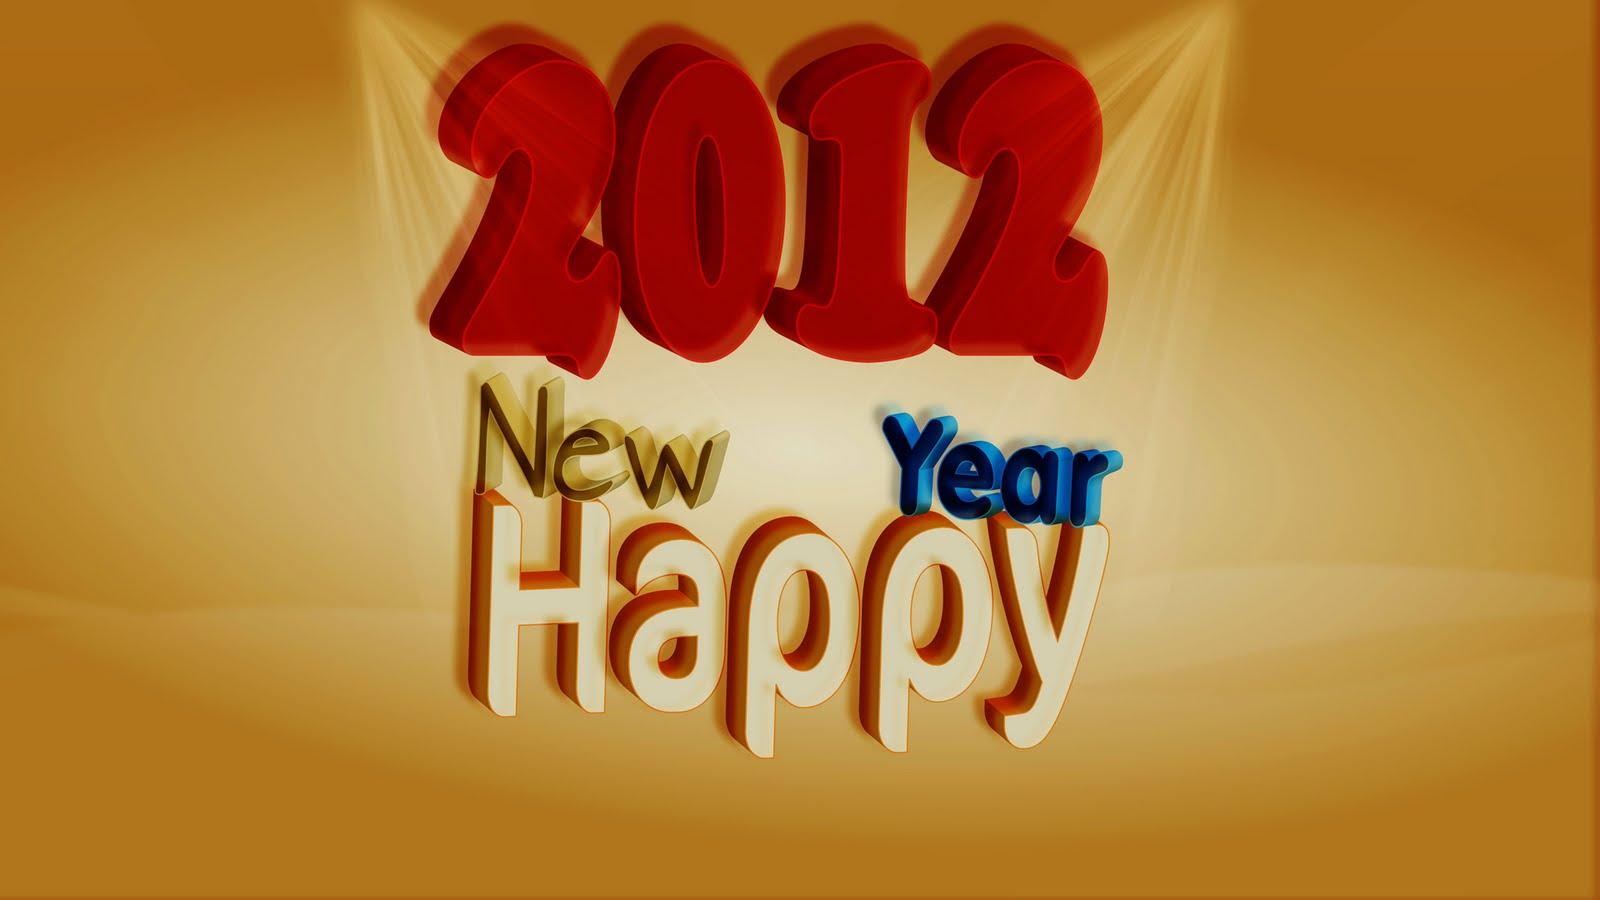 http://2.bp.blogspot.com/-rsDaQ2_CxdY/TuTB8hWFeBI/AAAAAAAAEBY/aWaARErbYE0/s1600/2012-Happy-New-Year-wallpaper.jpg